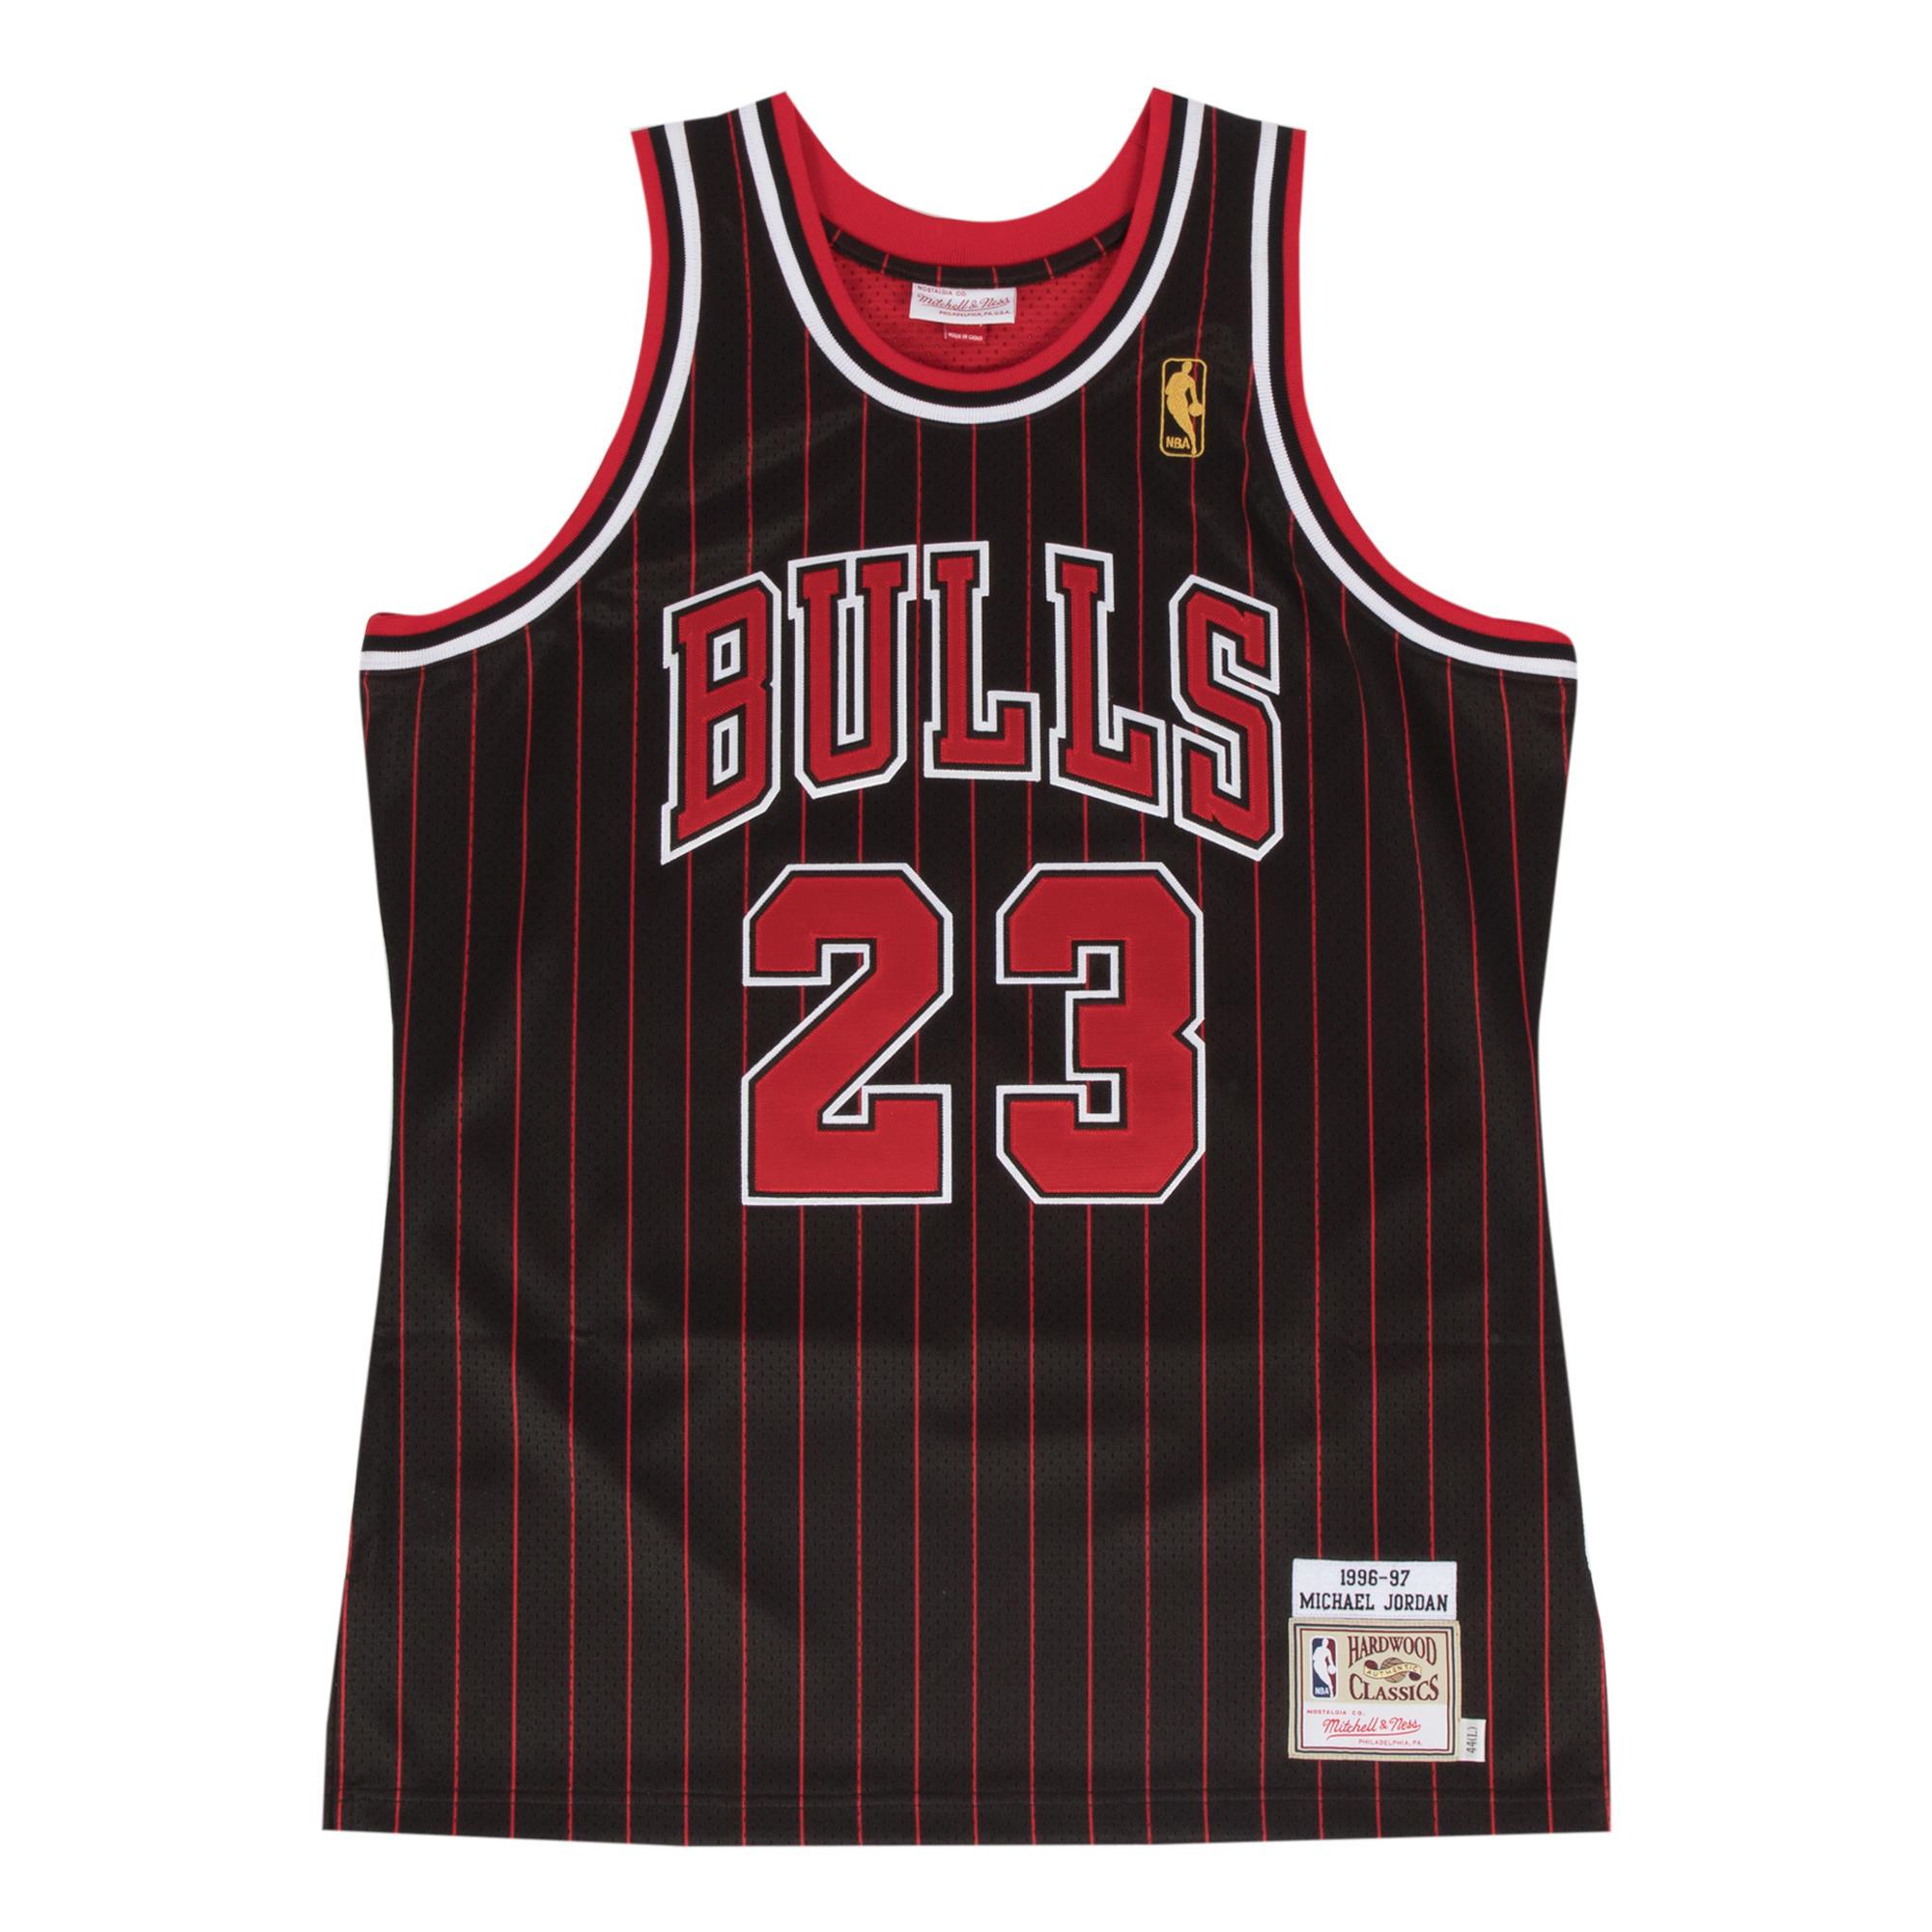 c1cb3478dd87 ... Michael Jordan 1996-97 Authentic Jersey Our Price  £200.00